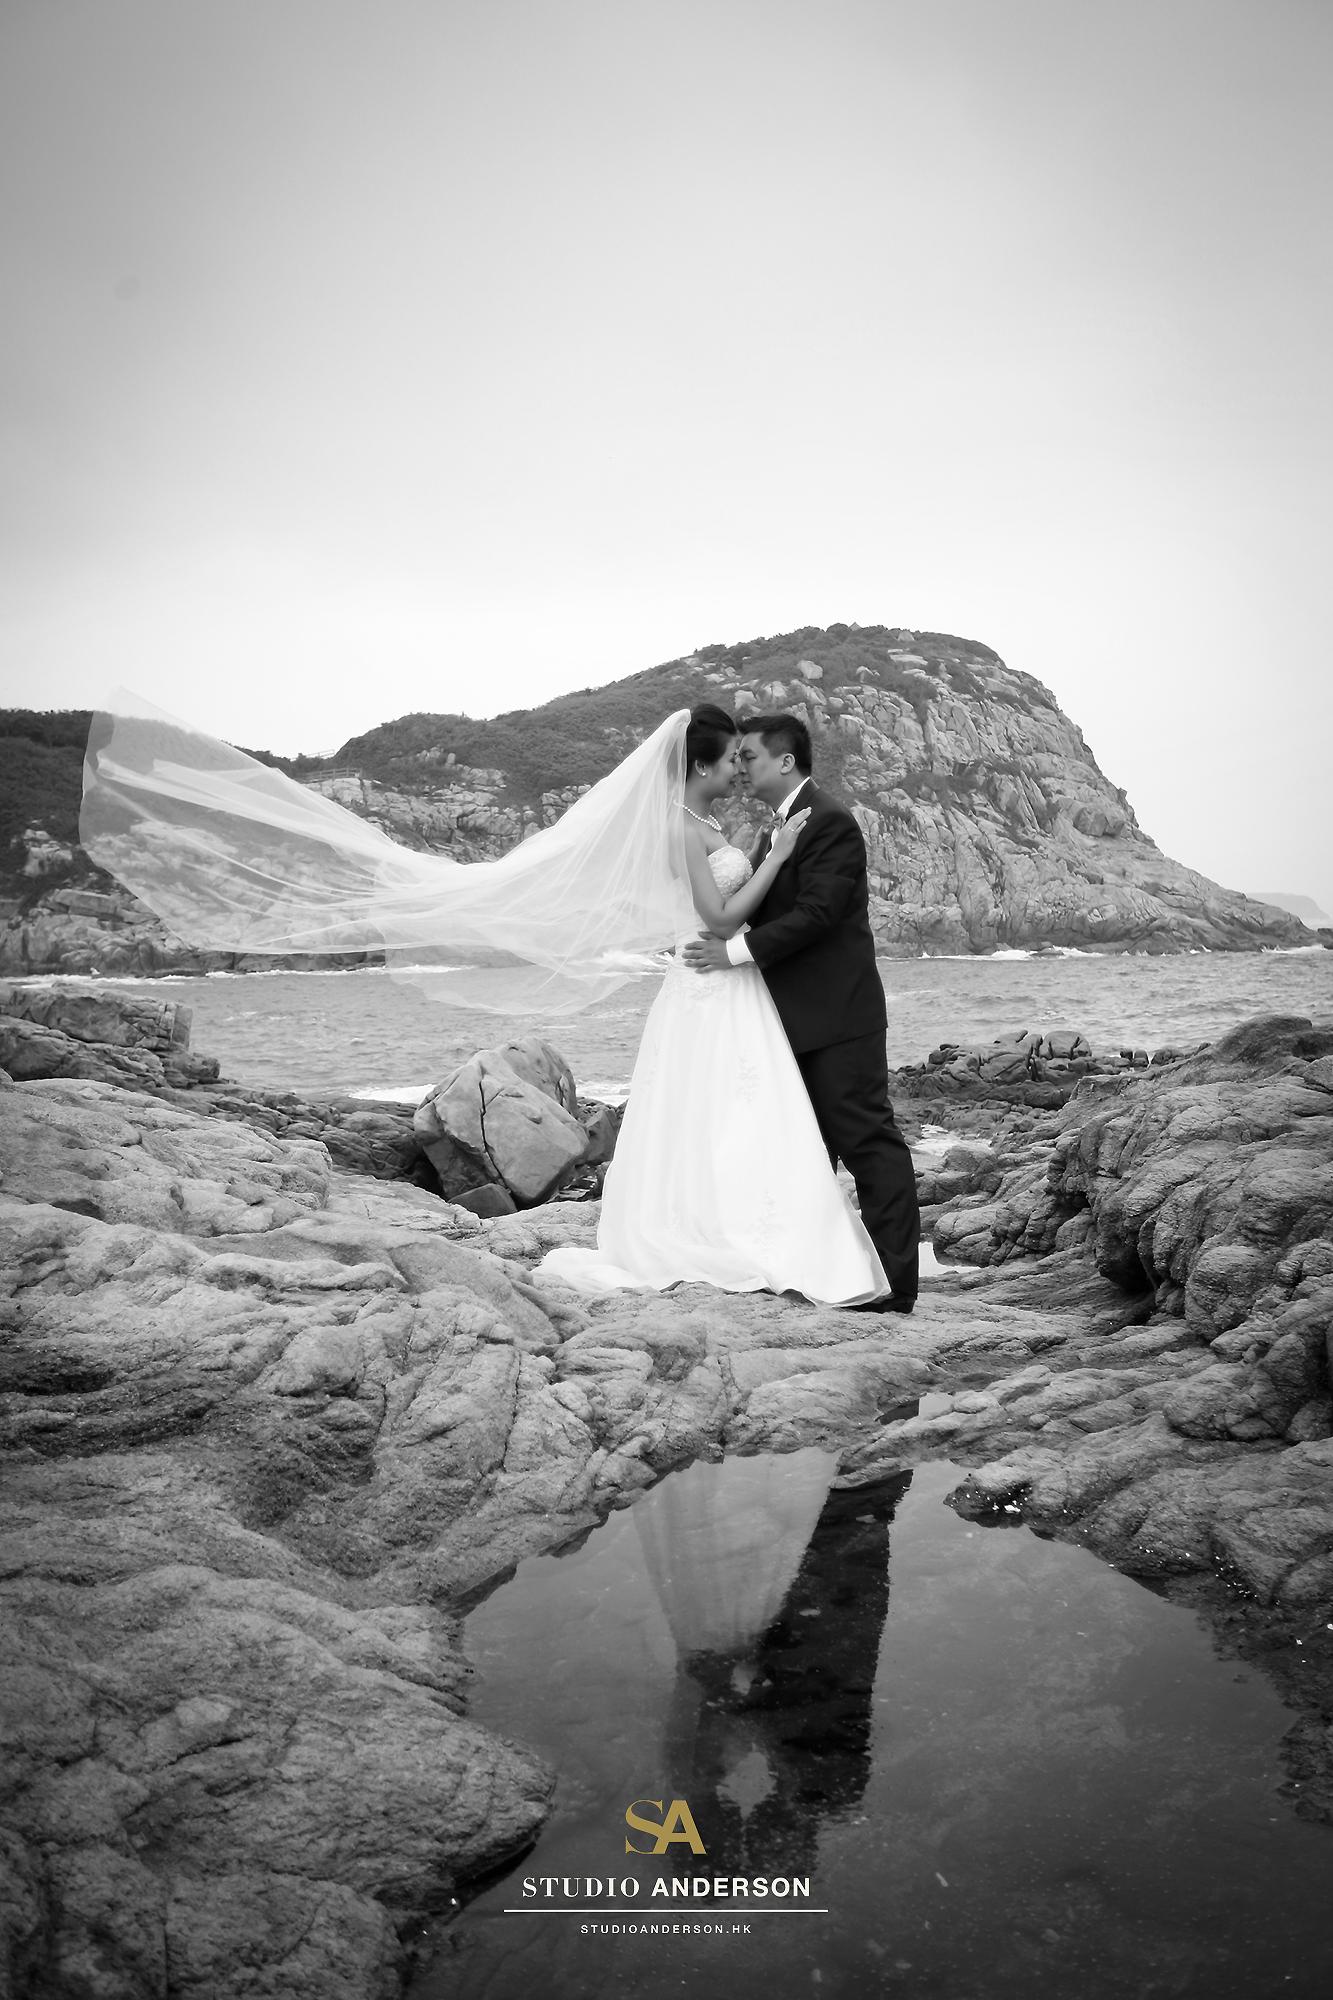 077 - Mandy and Joe Engagement (Watermark).jpg